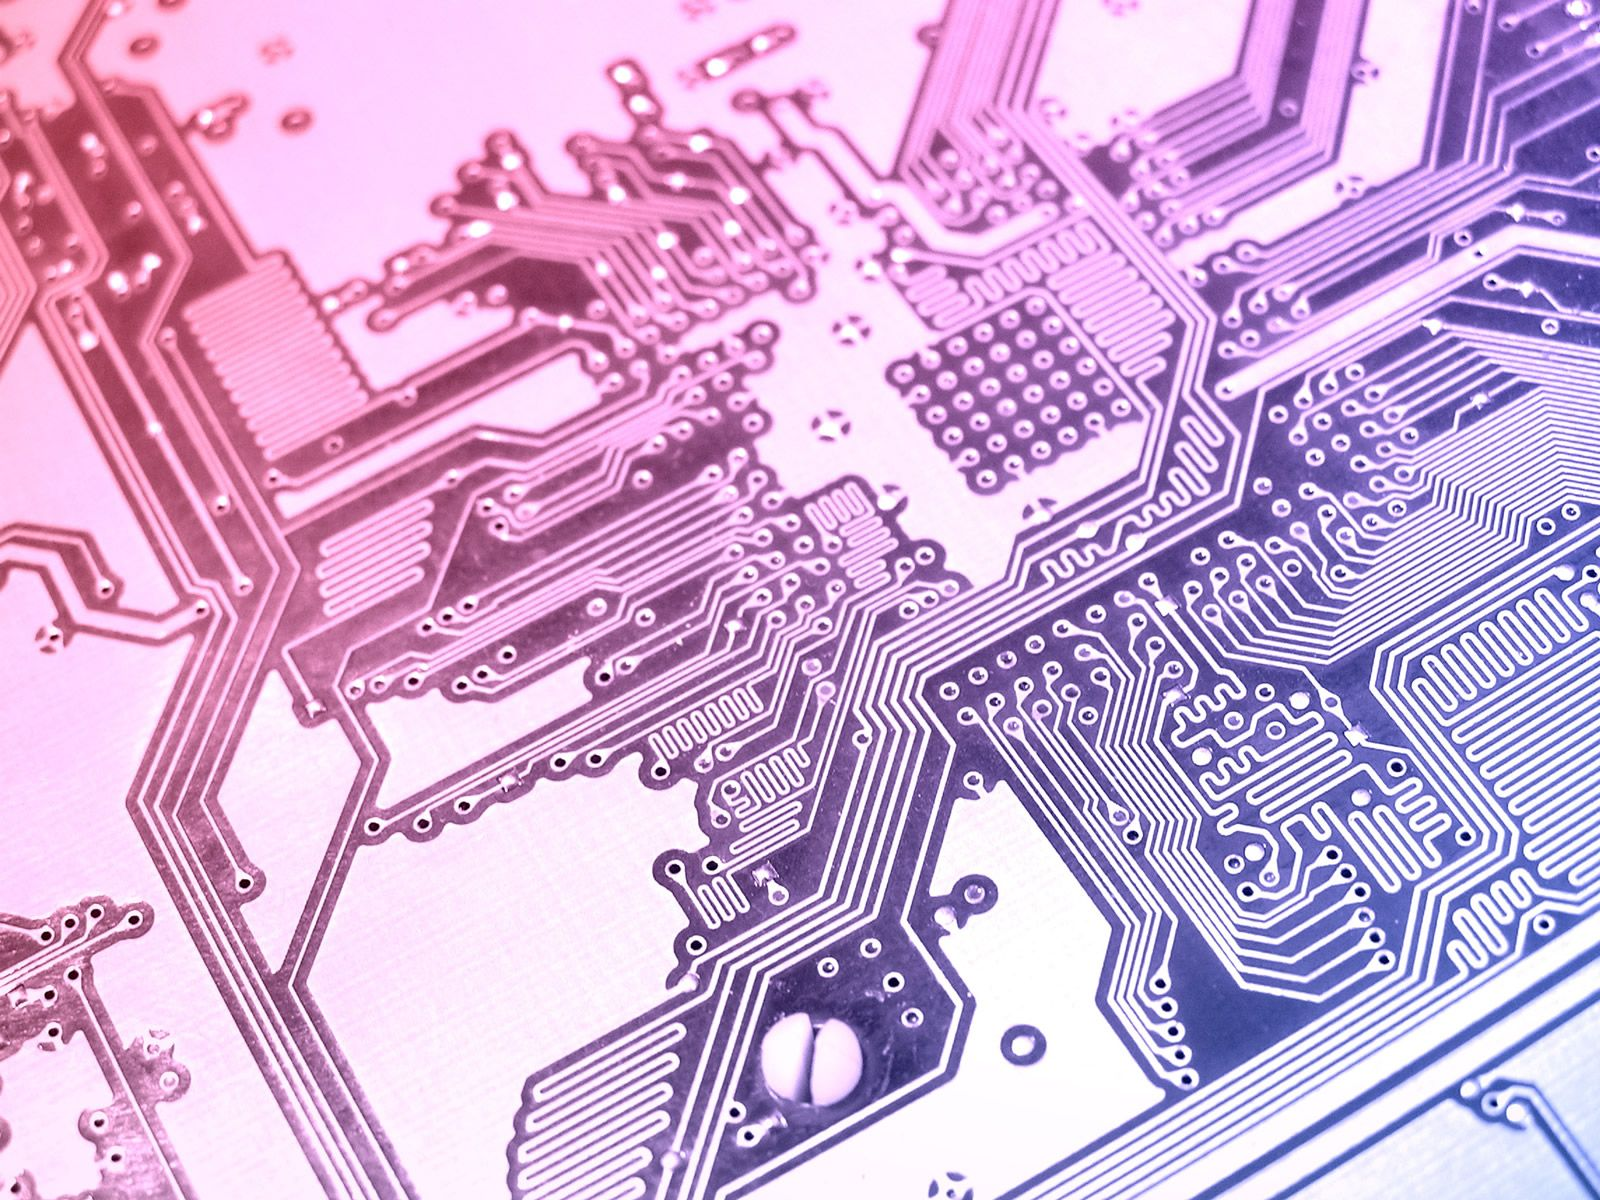 Advance Circuitry